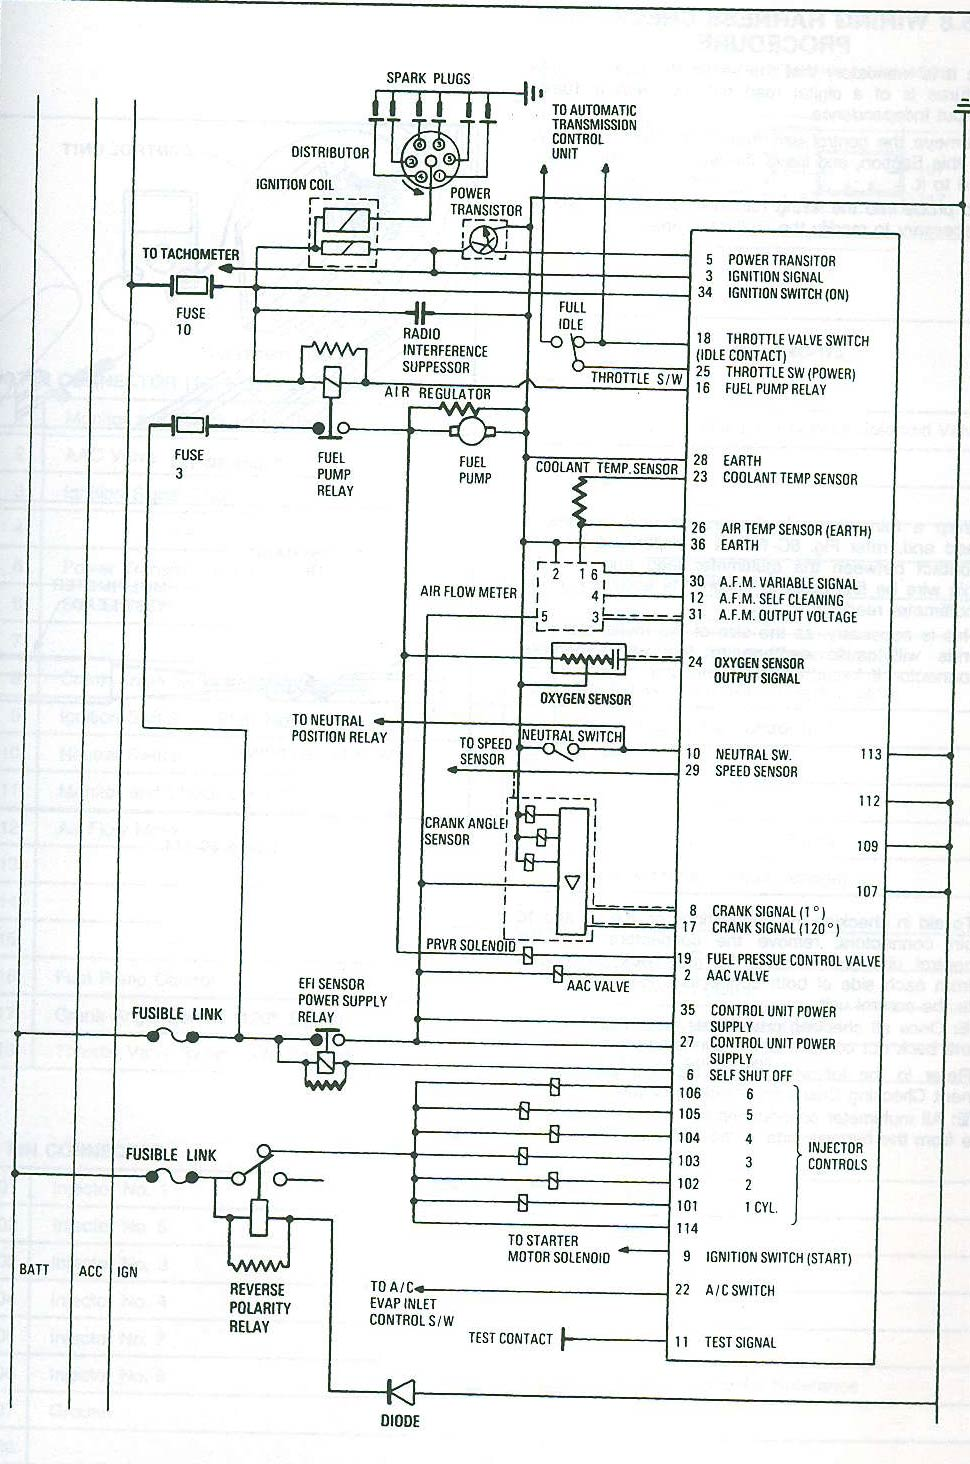 Modern Rb25det Engine Wiring Diagram For C33 Mold - Electrical ...